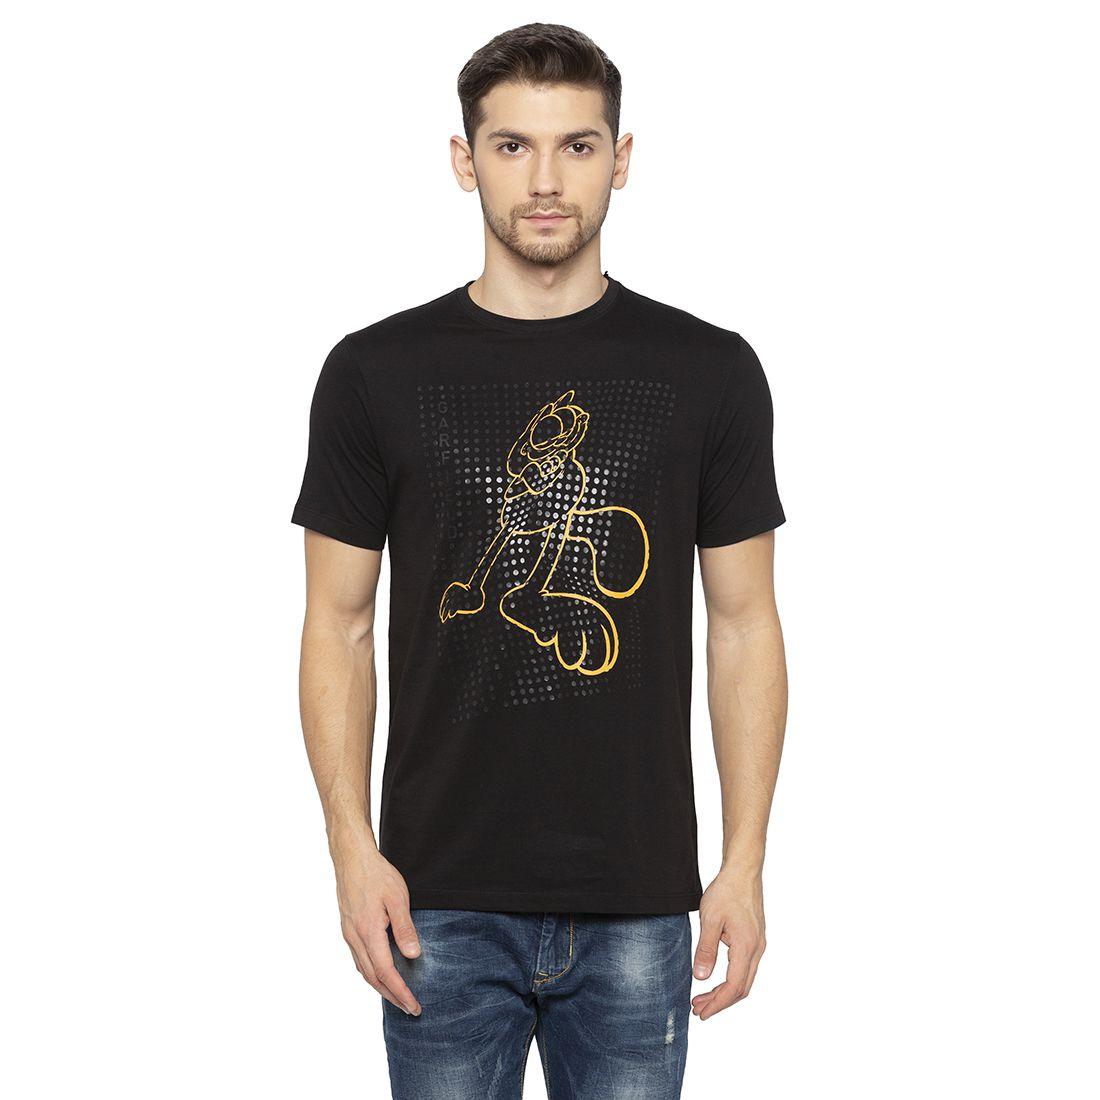 Status Quo 100 Percent Cotton Black Printed T-Shirt